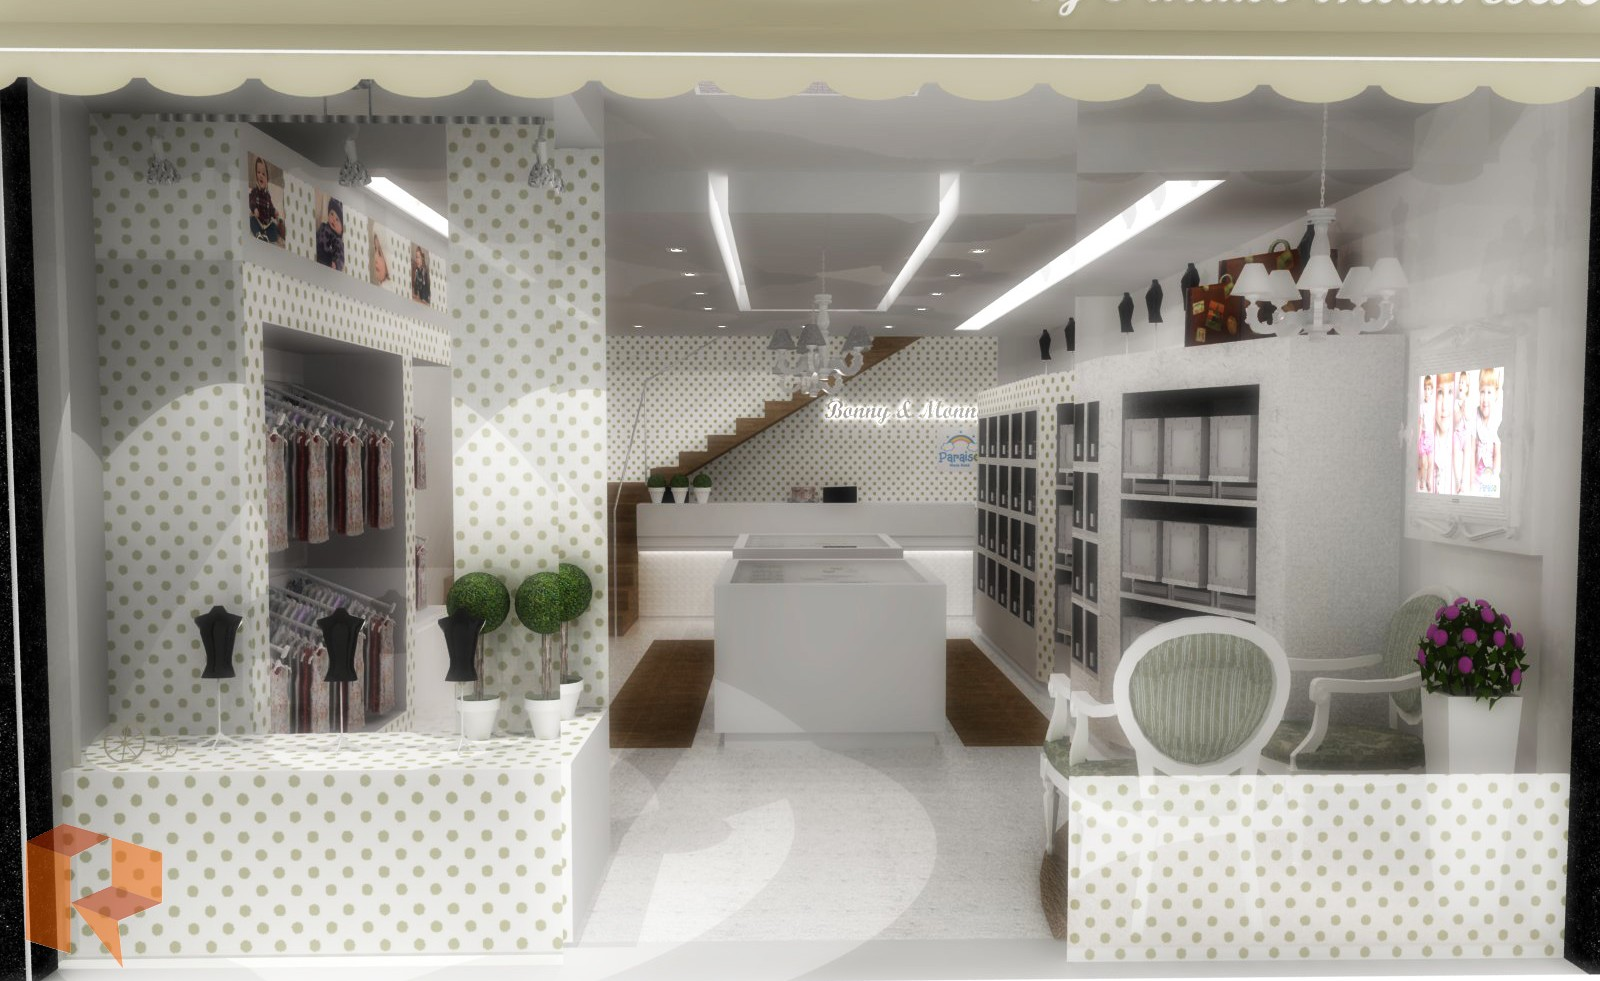 decoracao de interiores lojas:Arquiteta Aline Louise: Projeto de Interiores – Loja de Moda Bebê